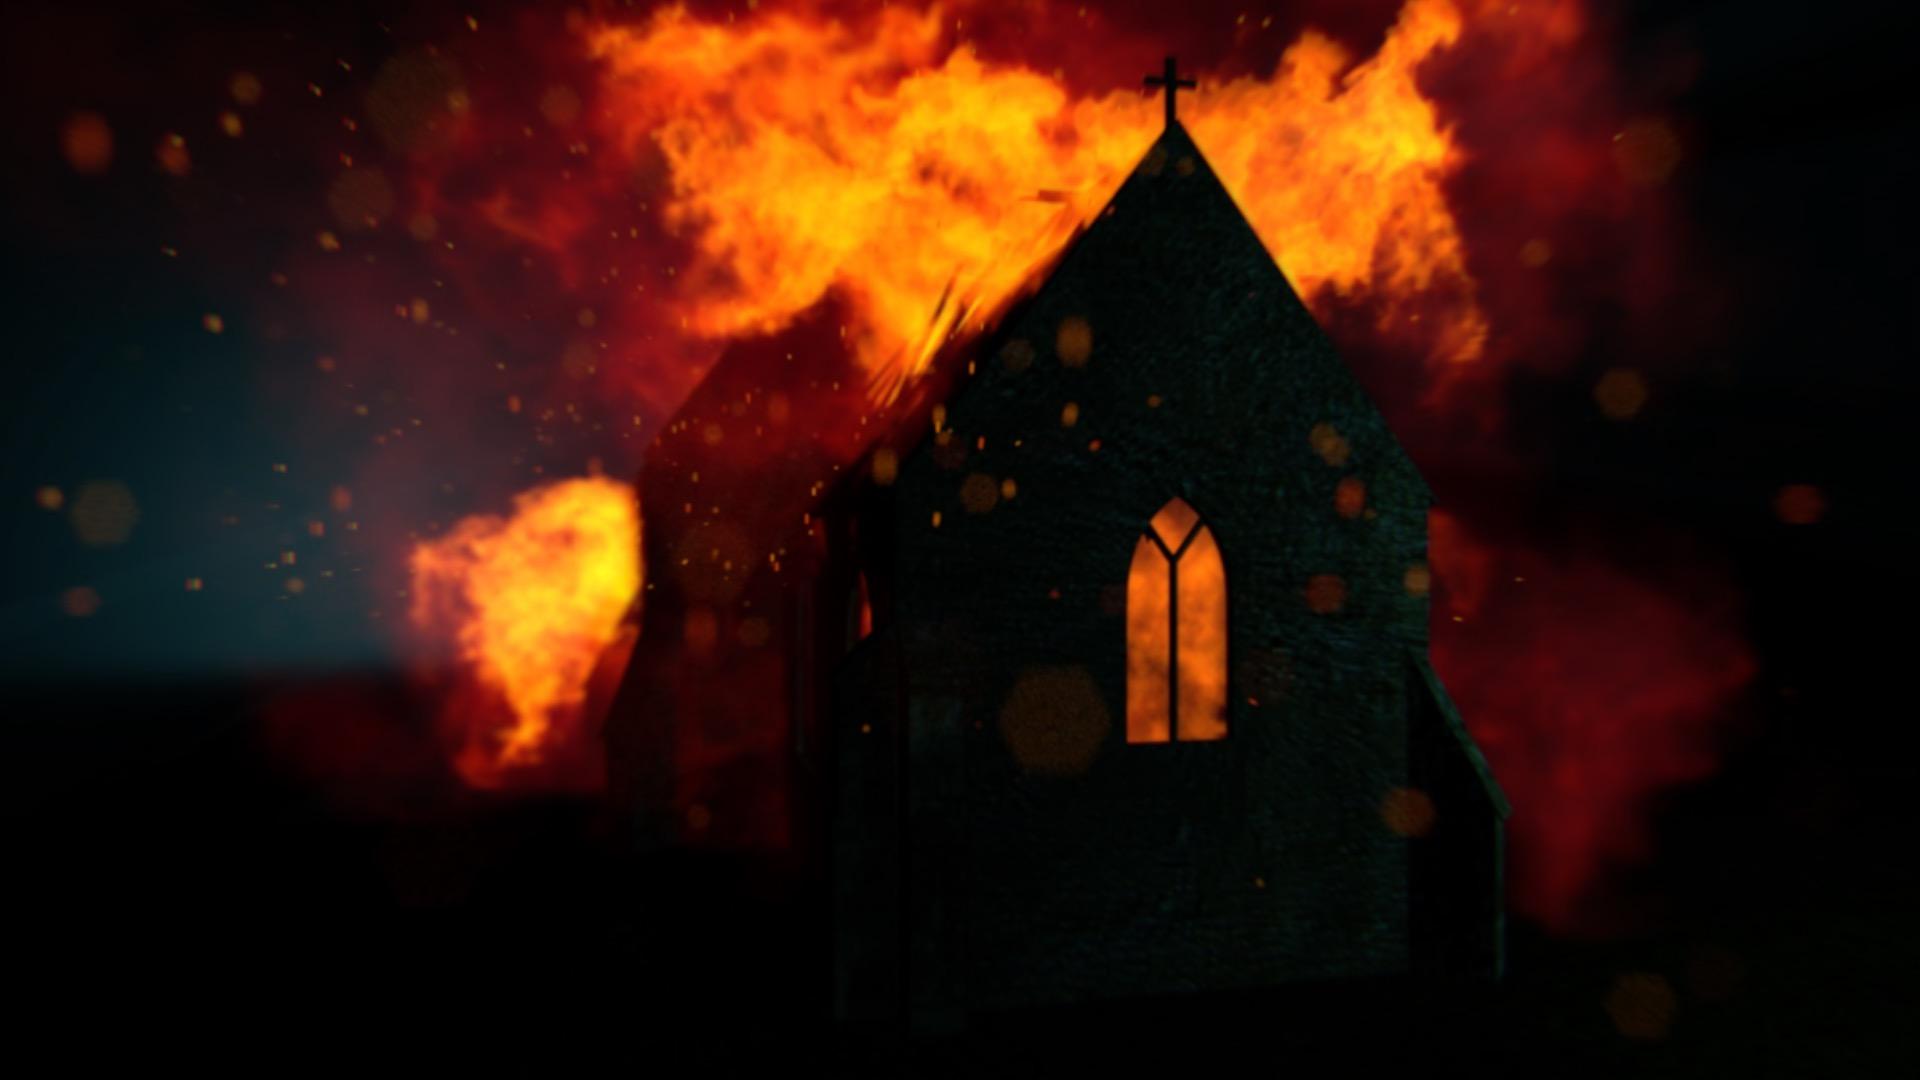 Fire and smoke simulation tests